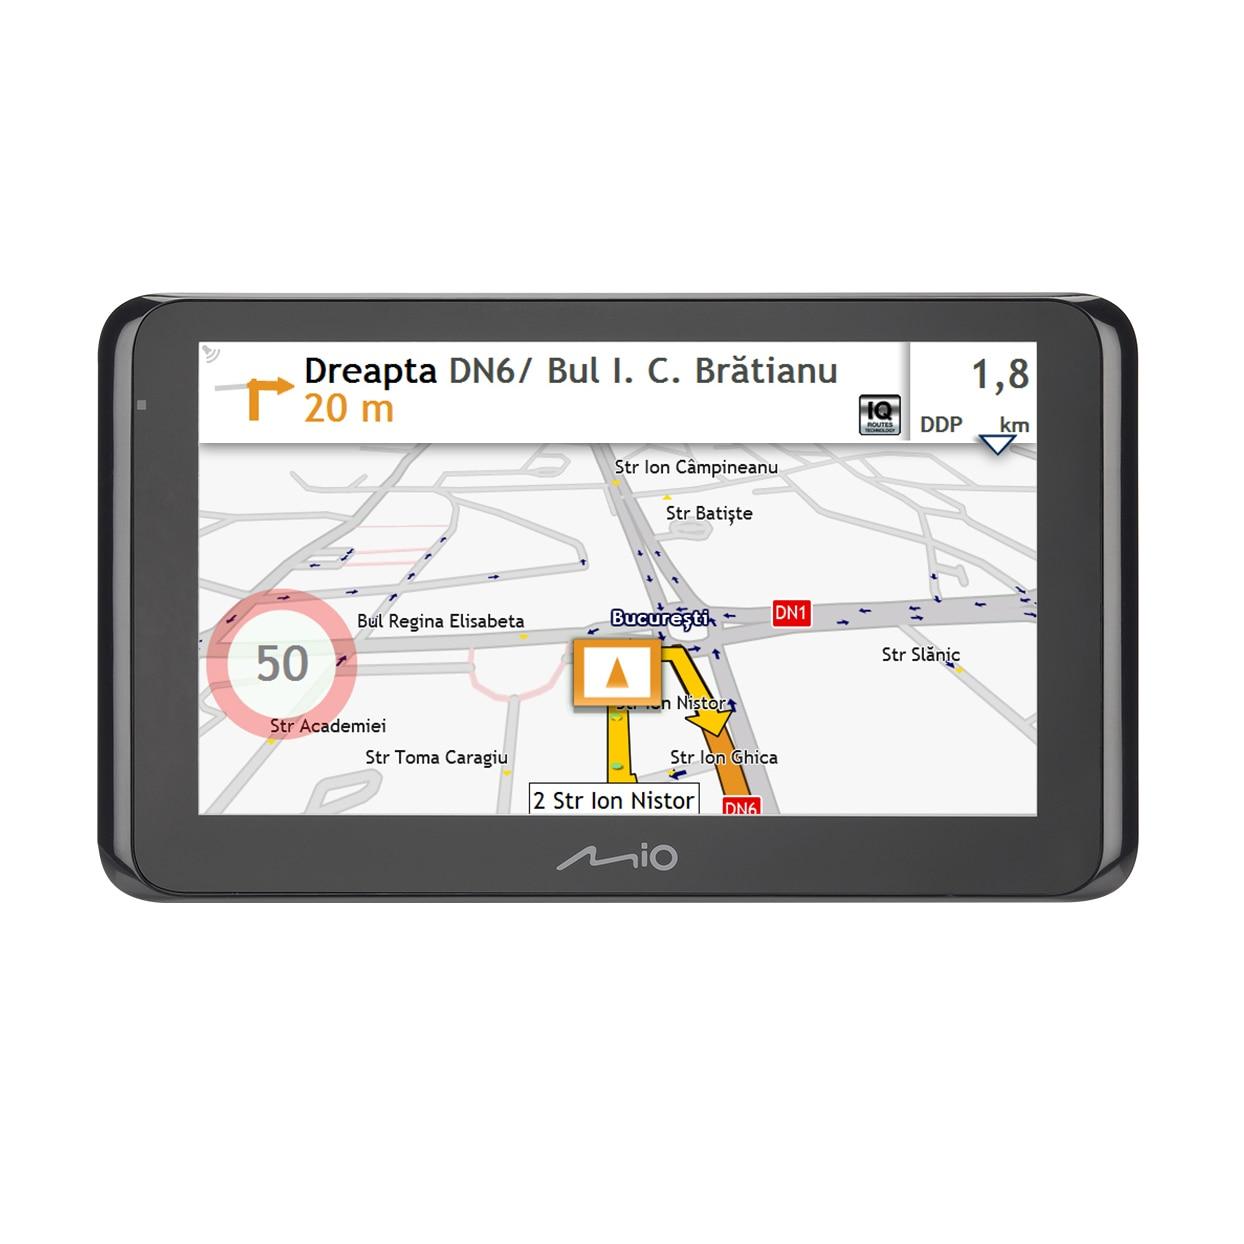 "Fotografie Sistem de navigatie Mio Spirit 8670 LM Truck, diagonala 6.2"", Bluetooth, TMC, Full Europe + actualizari gratuite pe viata"